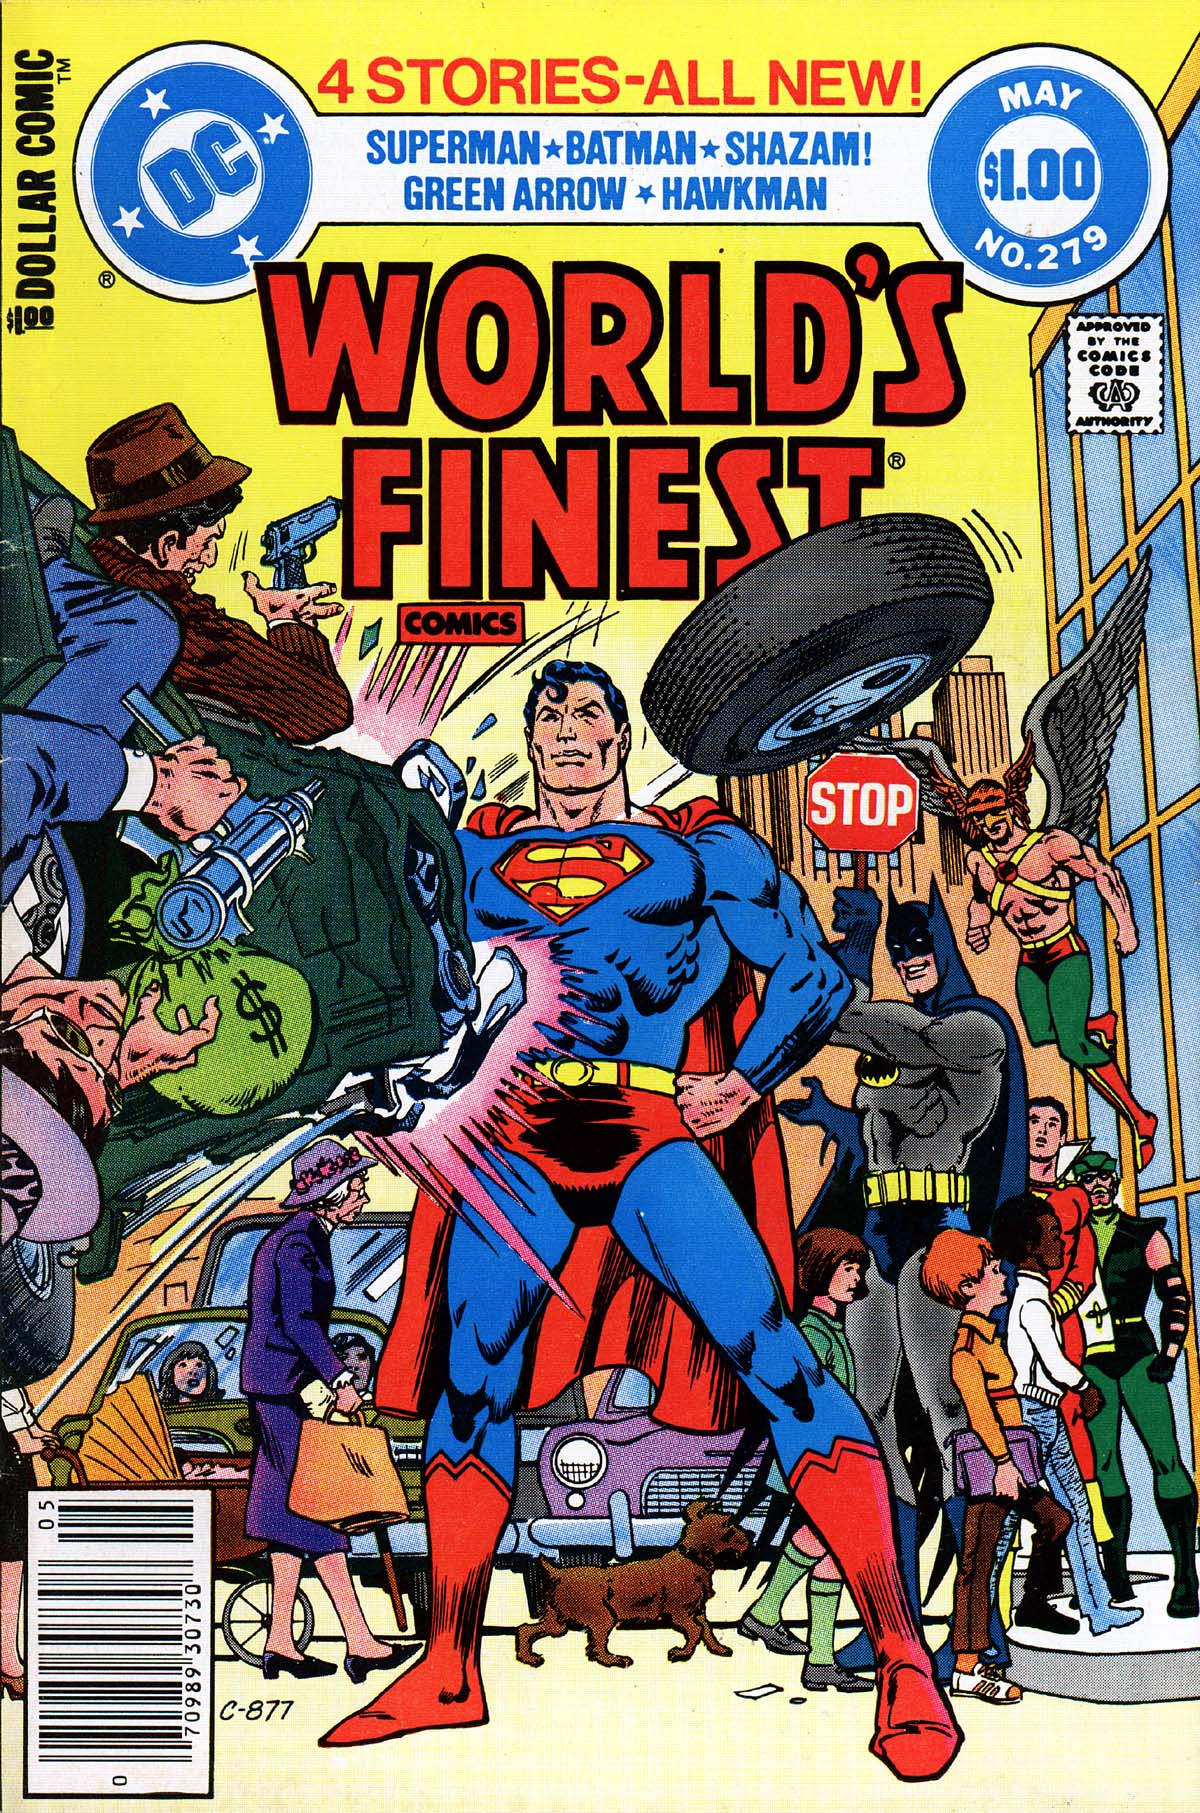 Read online World's Finest Comics comic -  Issue #279 - 1